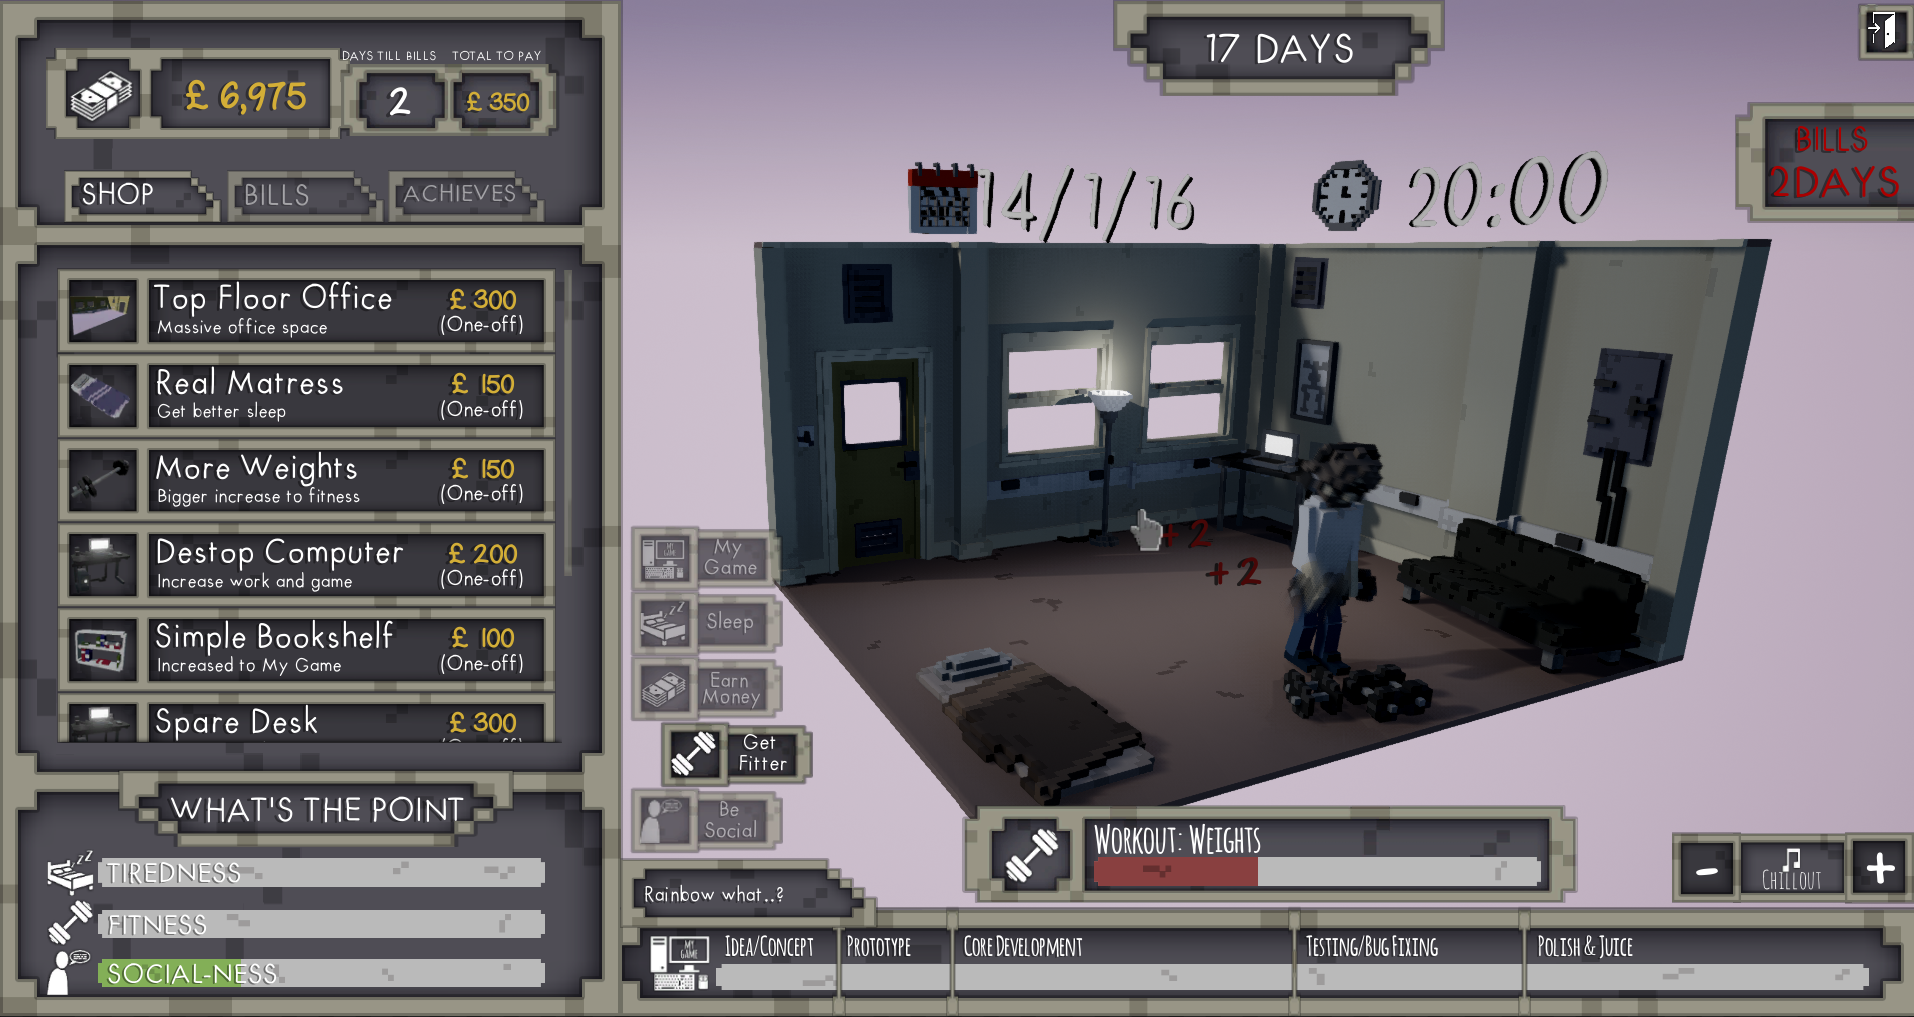 ids_screenshot03